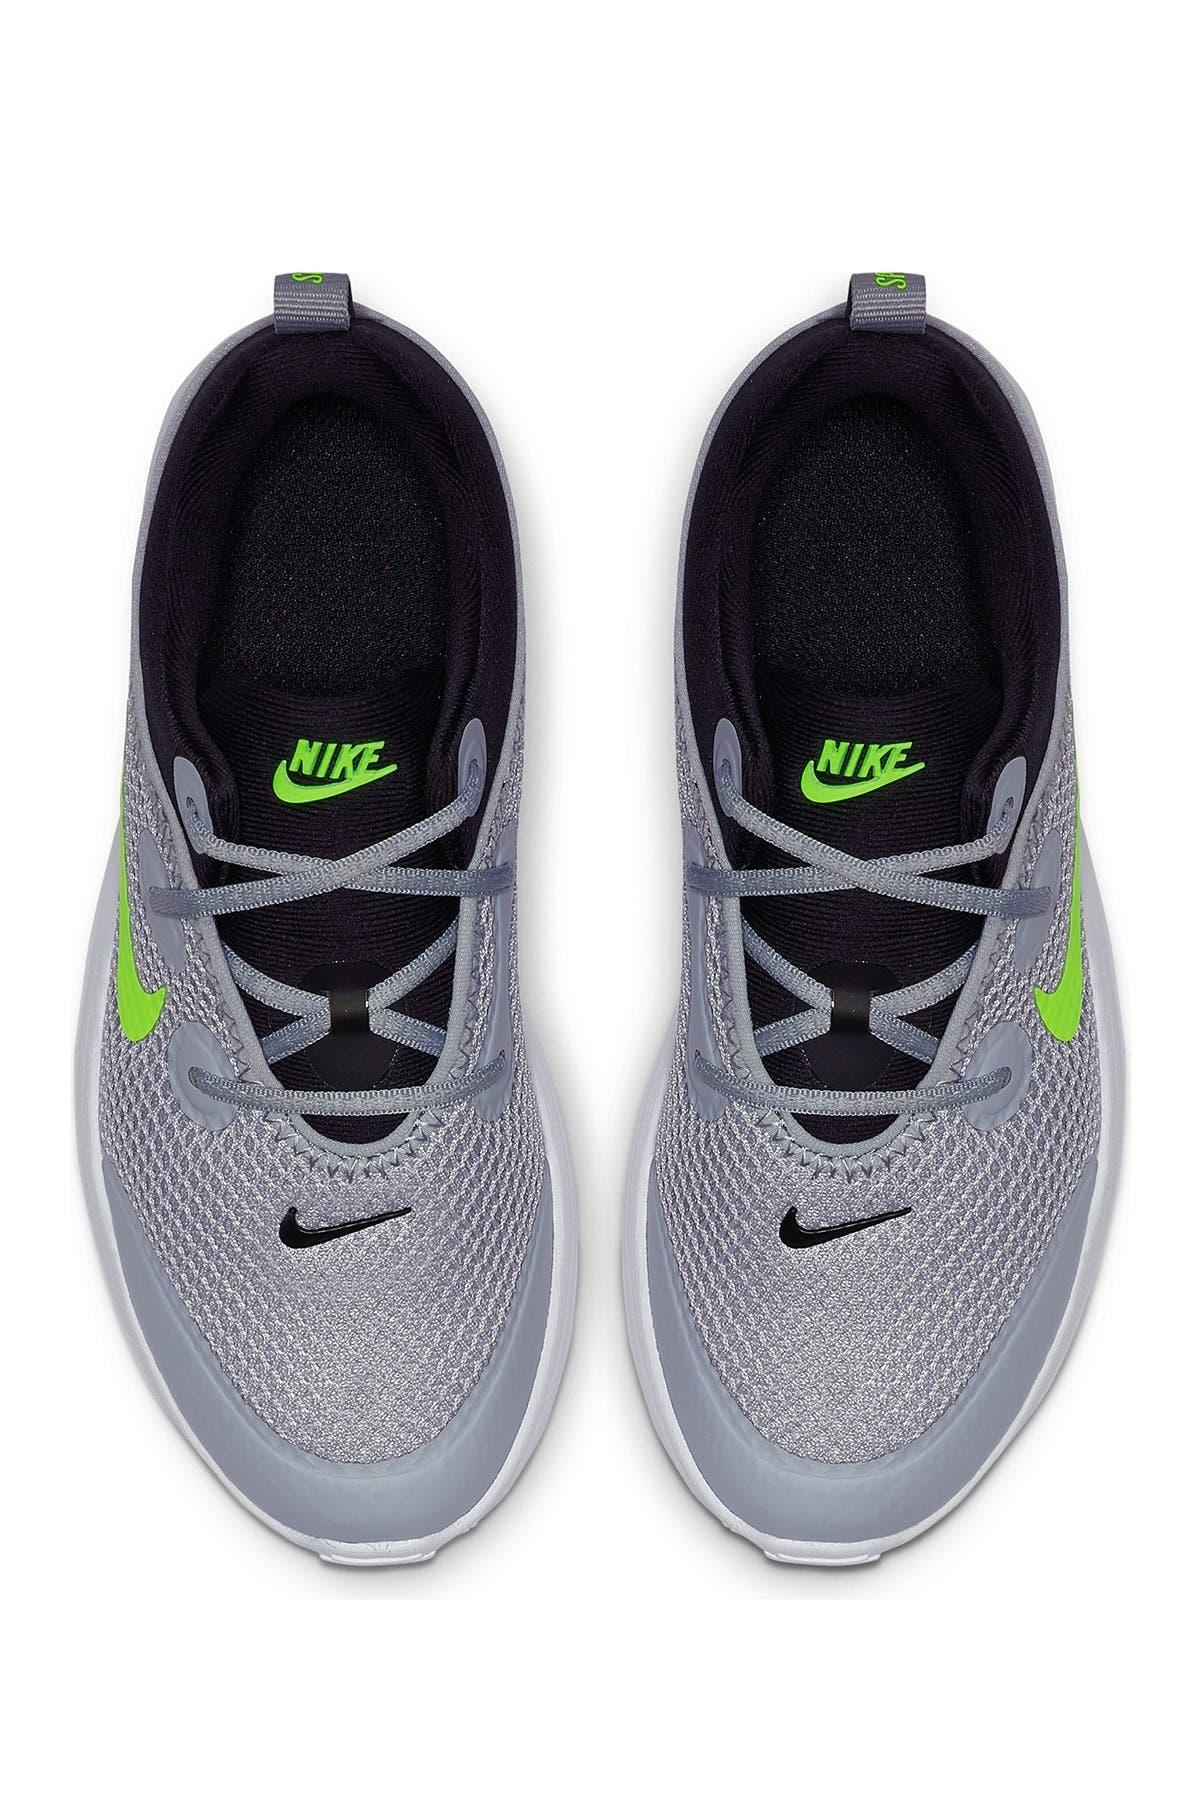 Nike | Acmi Sneaker | Nordstrom Rack